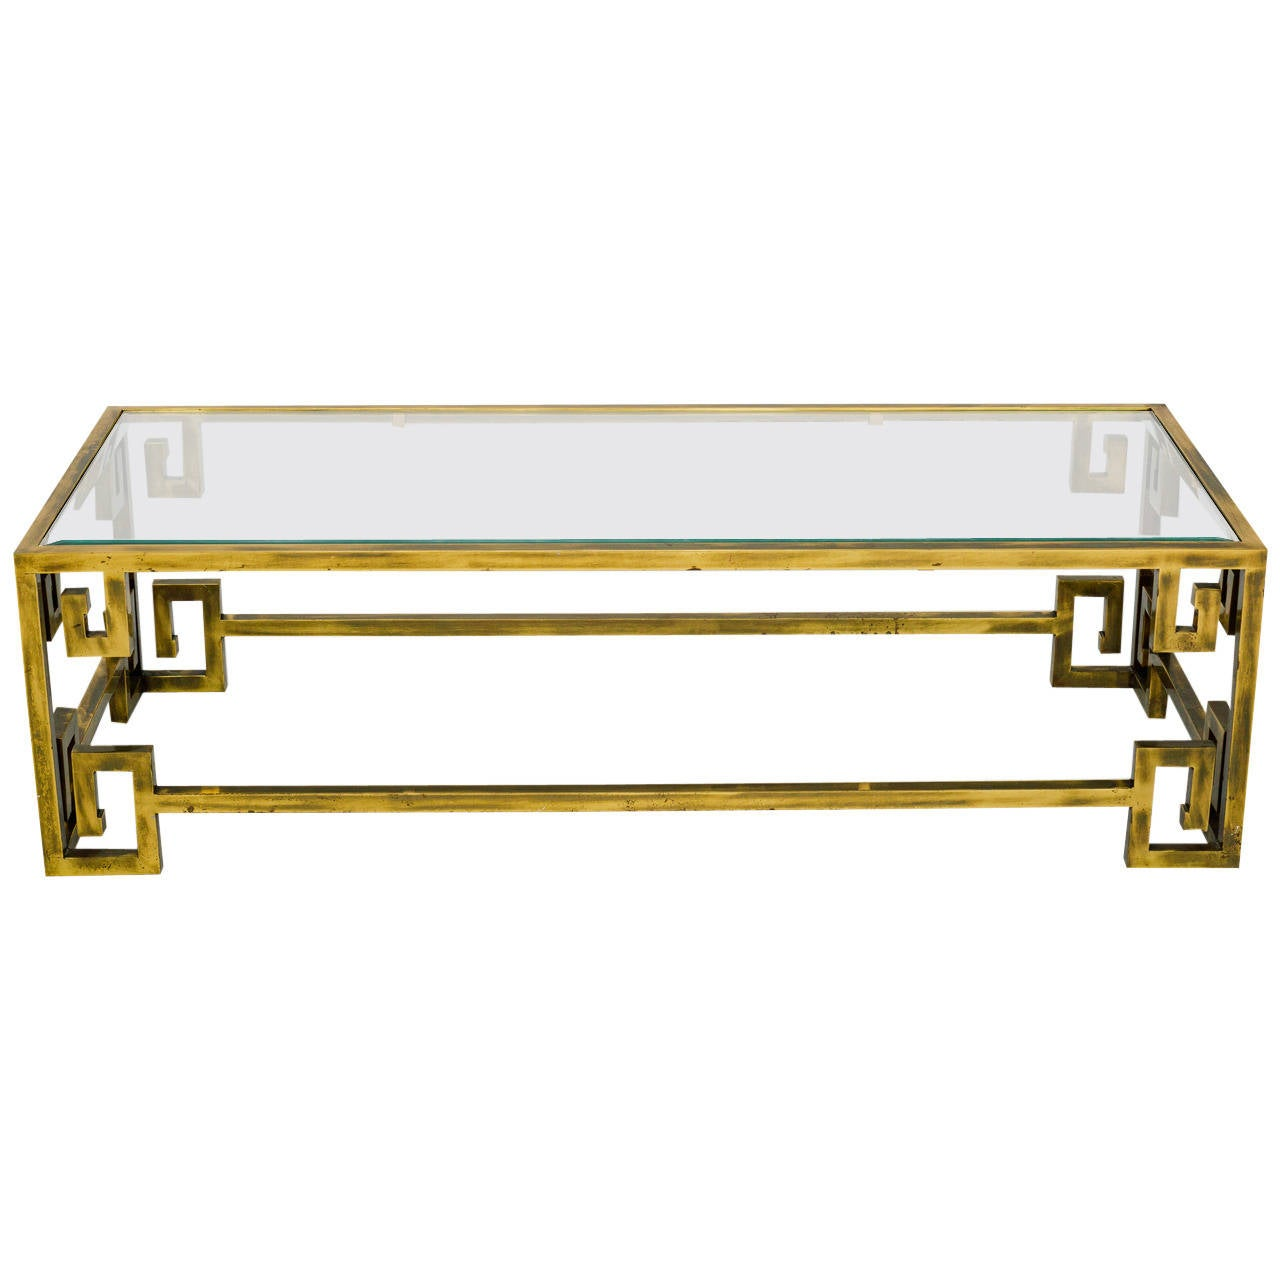 Mastercraft brass greek key coffee table for sale at 1stdibs mastercraft brass greek key coffee table 1 geotapseo Gallery